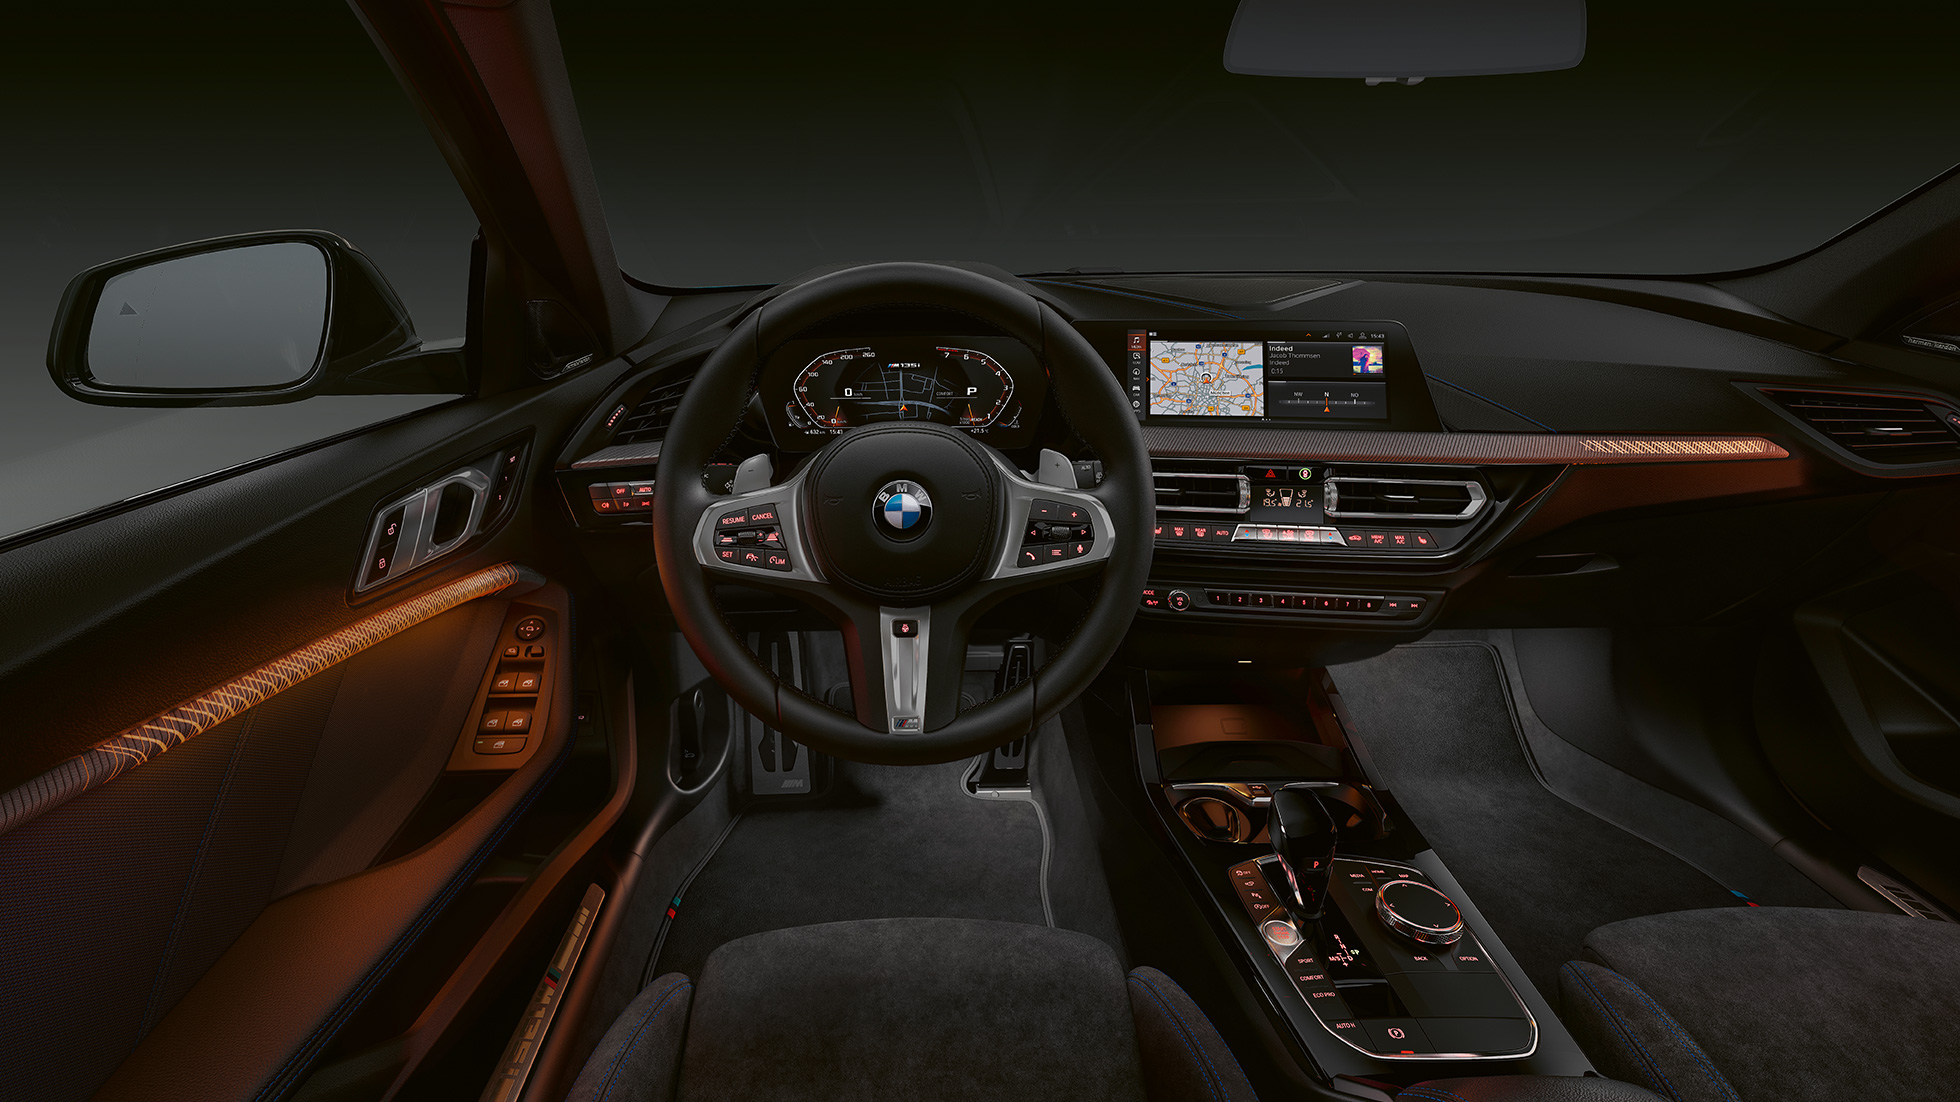 2018 - [BMW] Série 1 III [F40-F41] - Page 19 Bmw-1-series-m135i-inspire-mg-exterior-interior-desktop-04